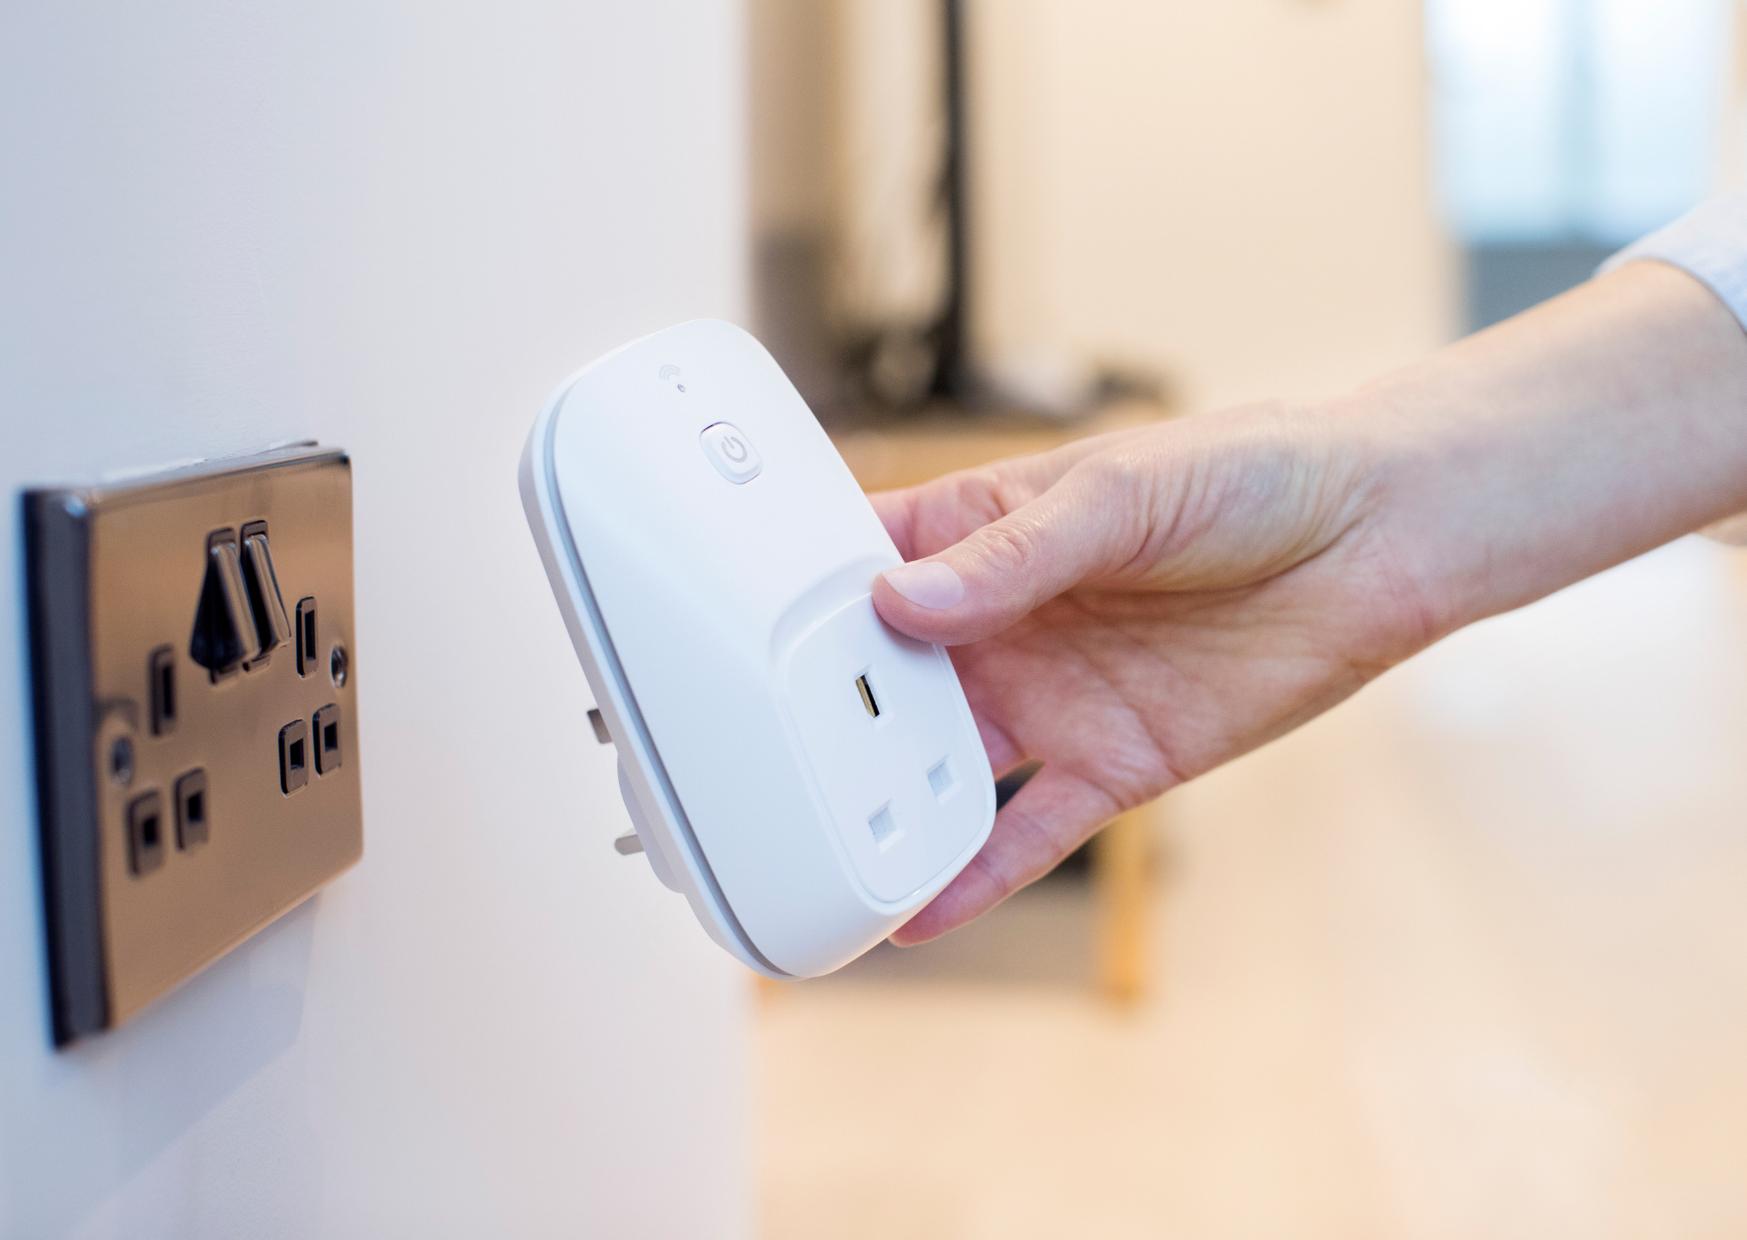 How to set up alexa smart plug